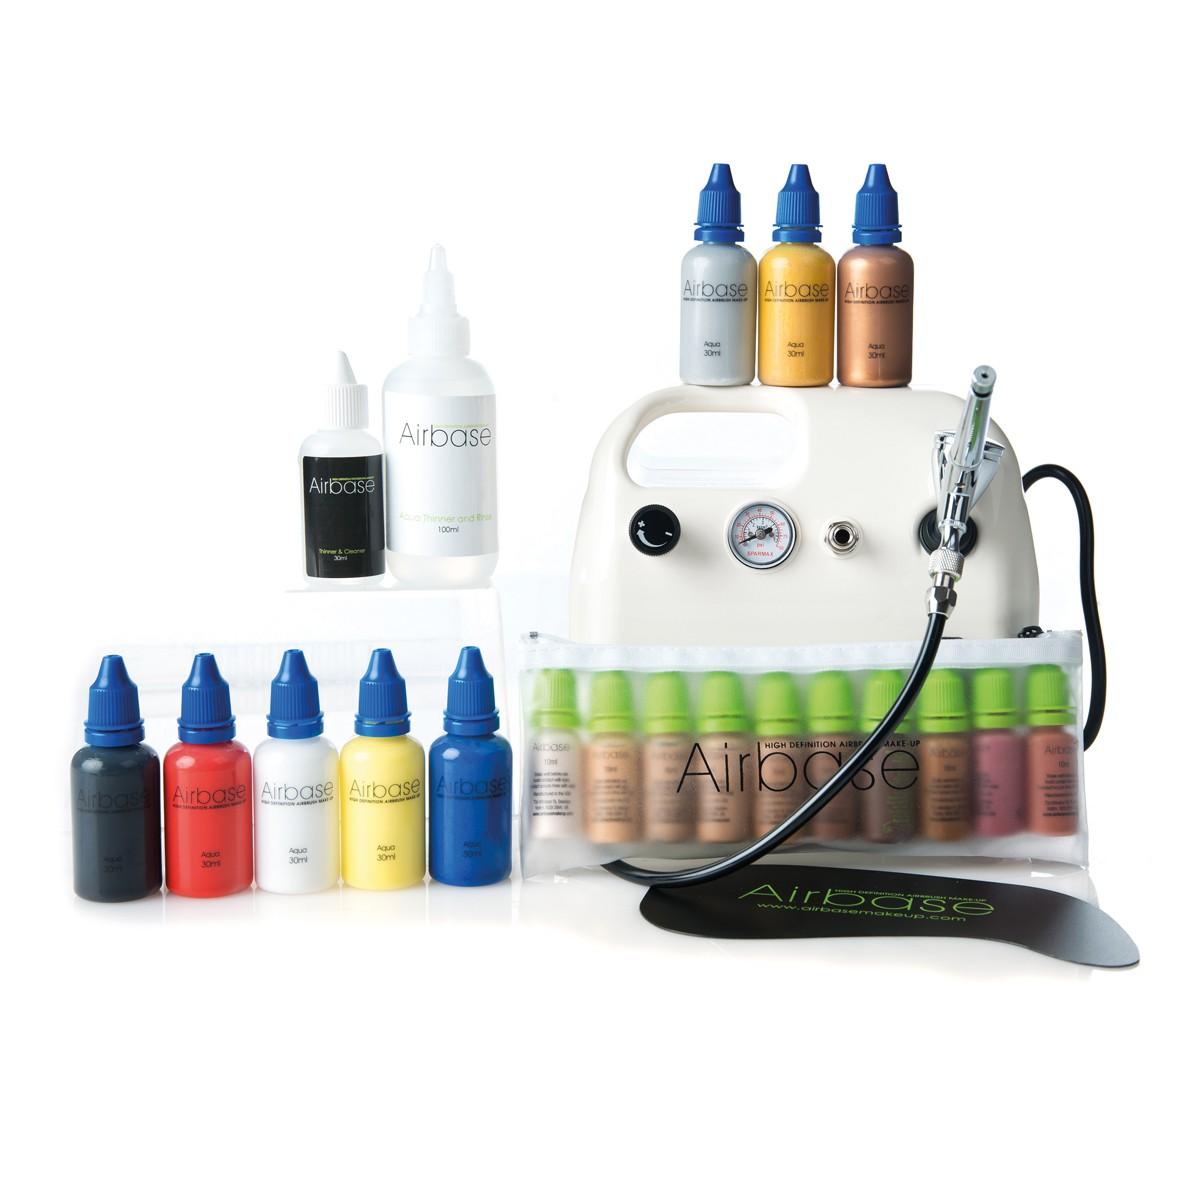 Airbrush Make-up and Airbrush Body Art Complete Kit